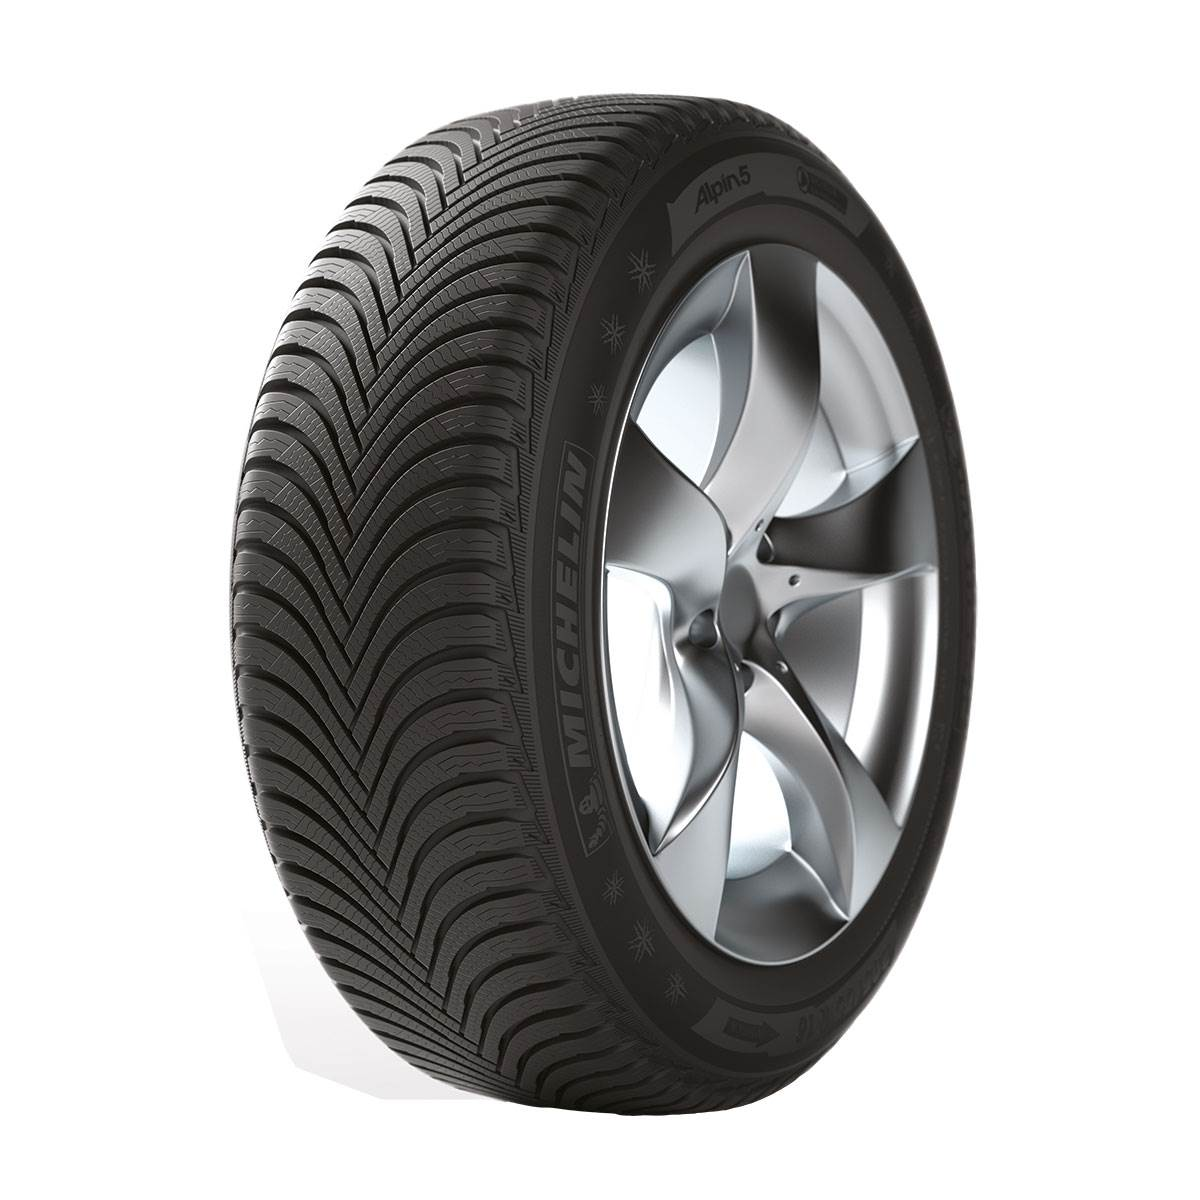 Pneu Hiver Michelin 205/60R15 91T Alpin A5